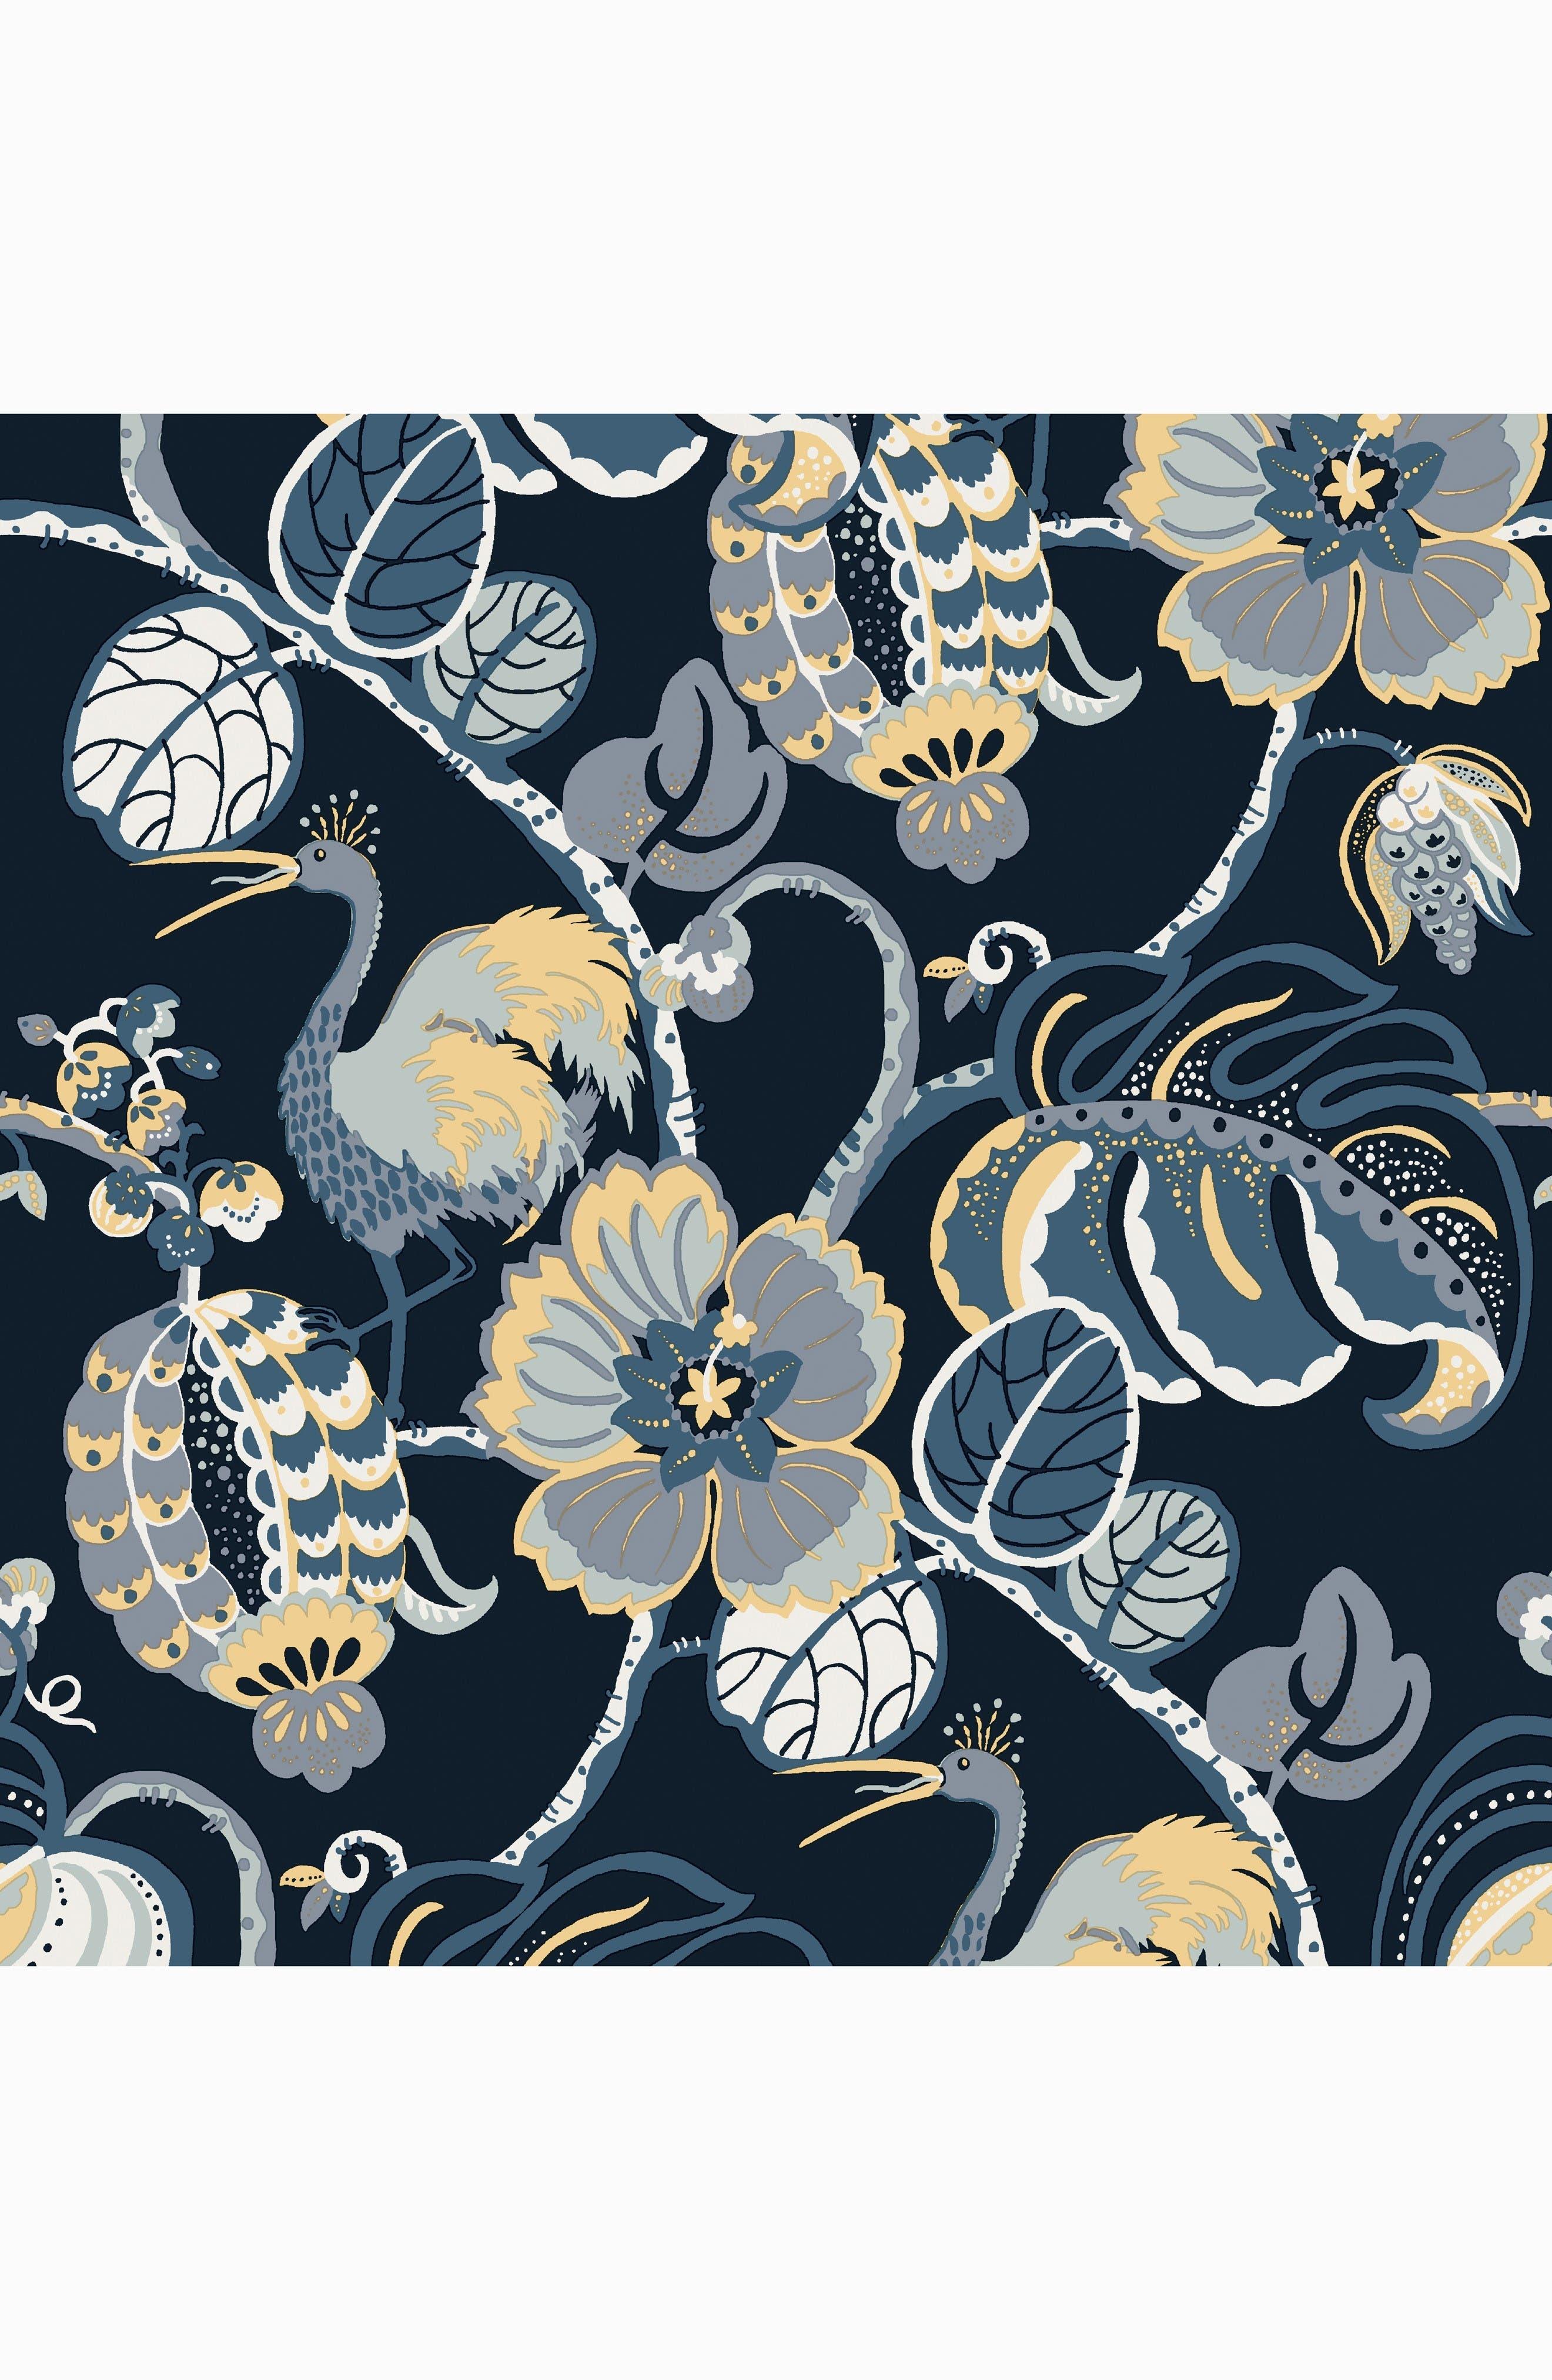 Tropical Fête Self-Adhesive Vinyl Wallpaper,                         Main,                         color, Azure Blue